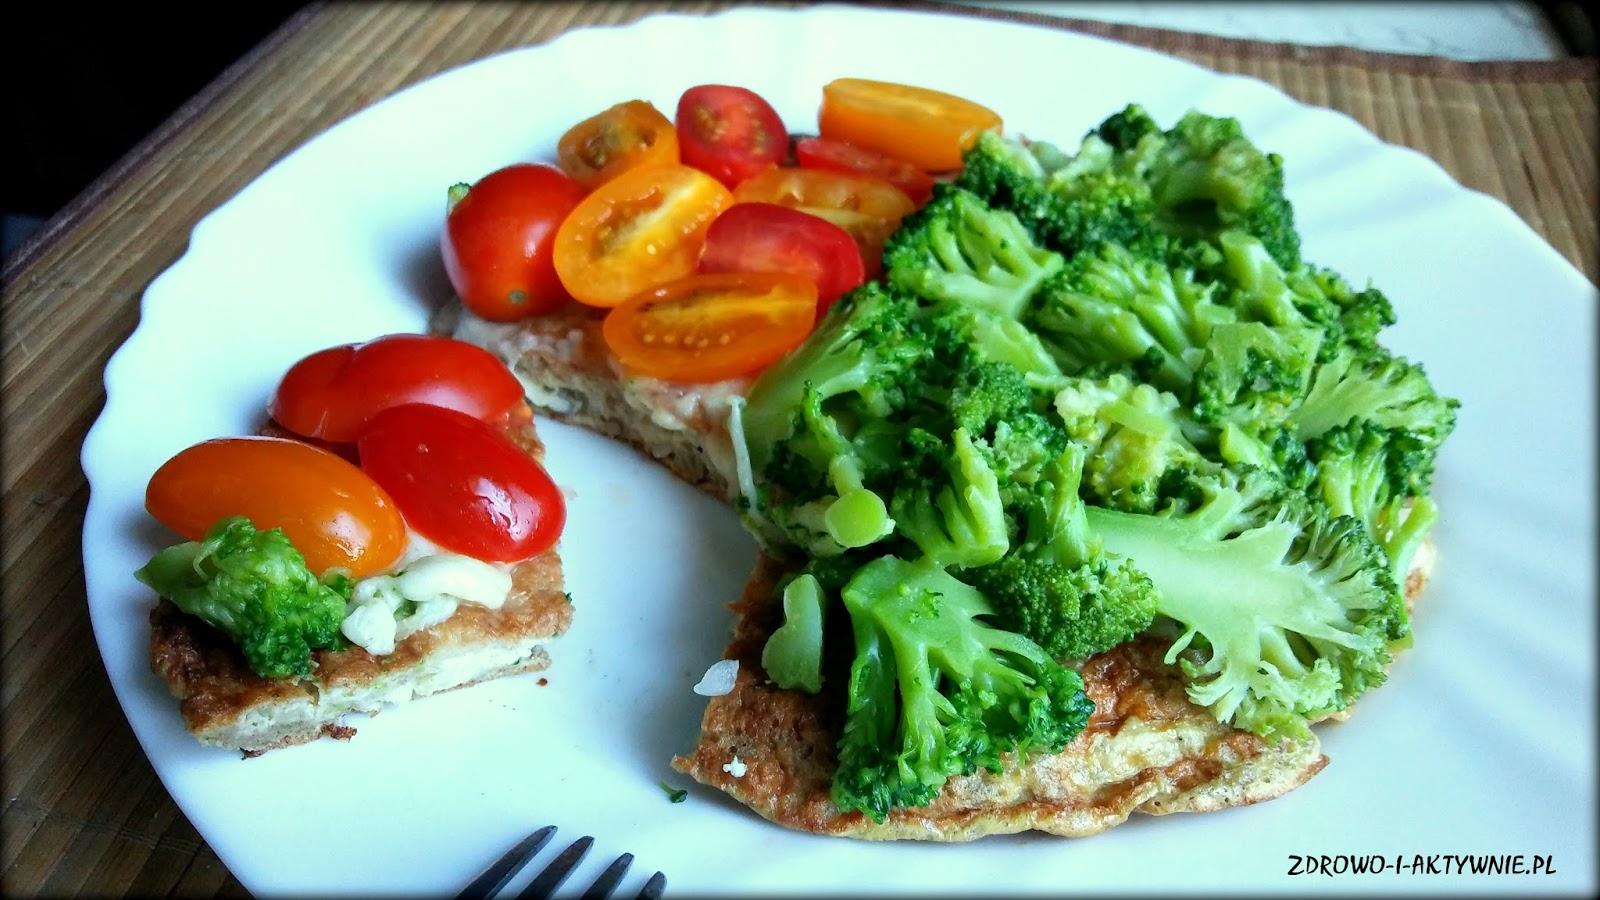 Żytni omlet z mozzarellą i warzywami